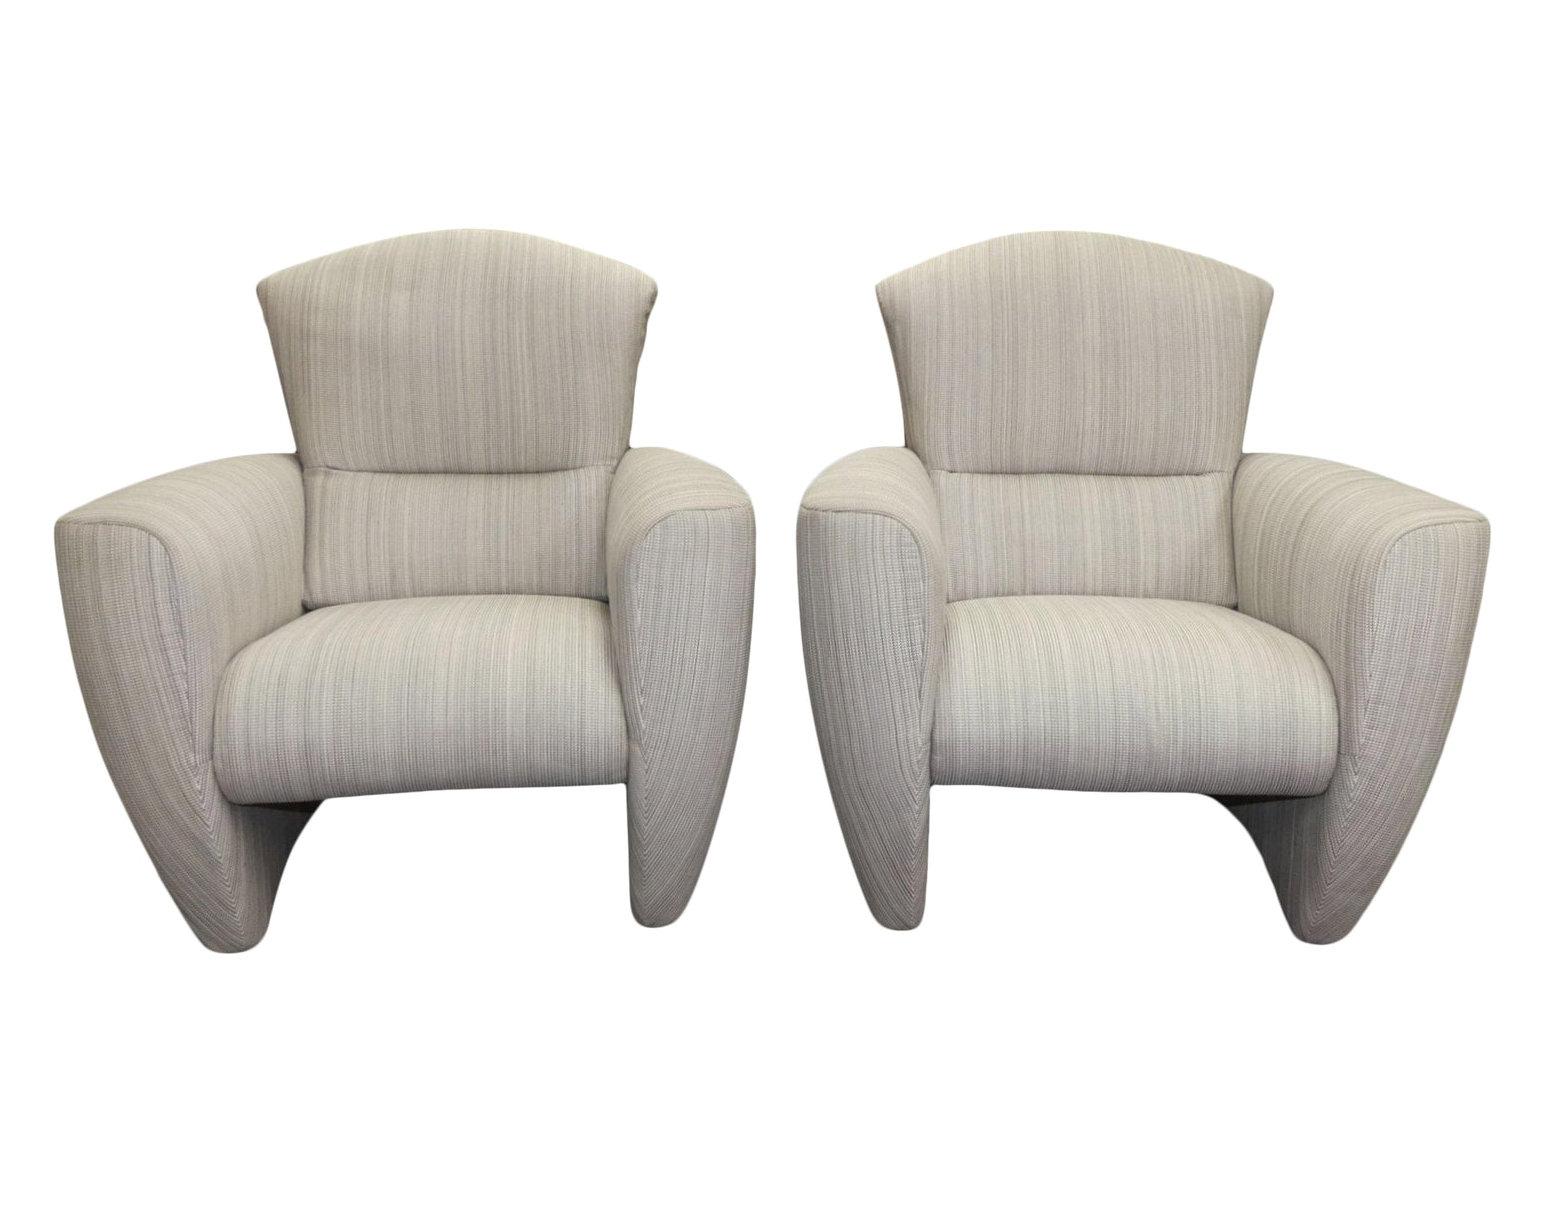 Pair of Modern Club Chairs Made in Belgium by Jori